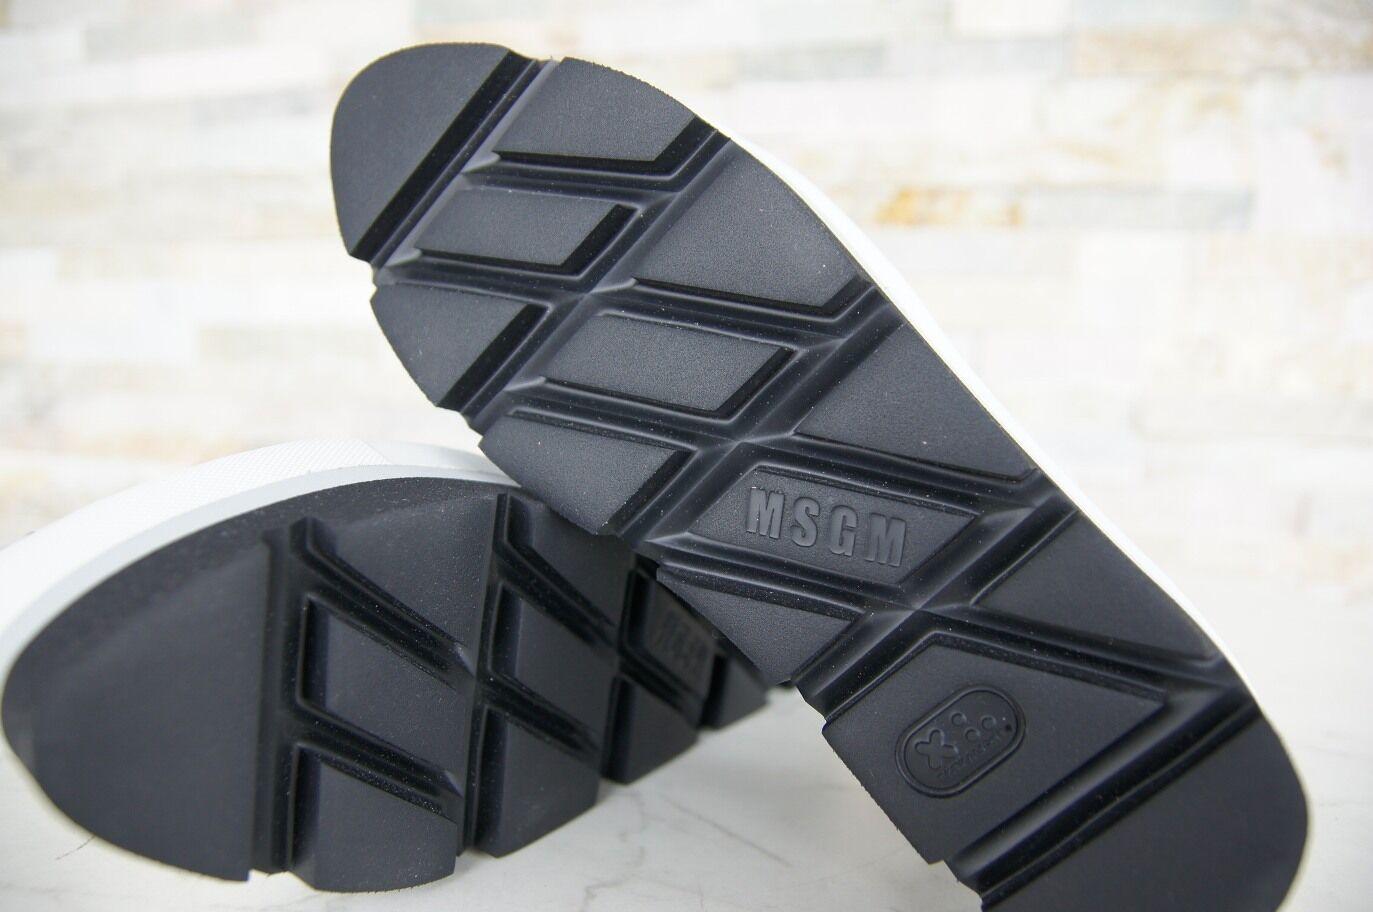 Msgm Gr 38 Plateau Pantofola Pantofola Pantofola Decolleté Scarpe Basse Nero Nuovo Origin. | Numeroso Nella Varietà  | Gentiluomo/Signora Scarpa  6063b5